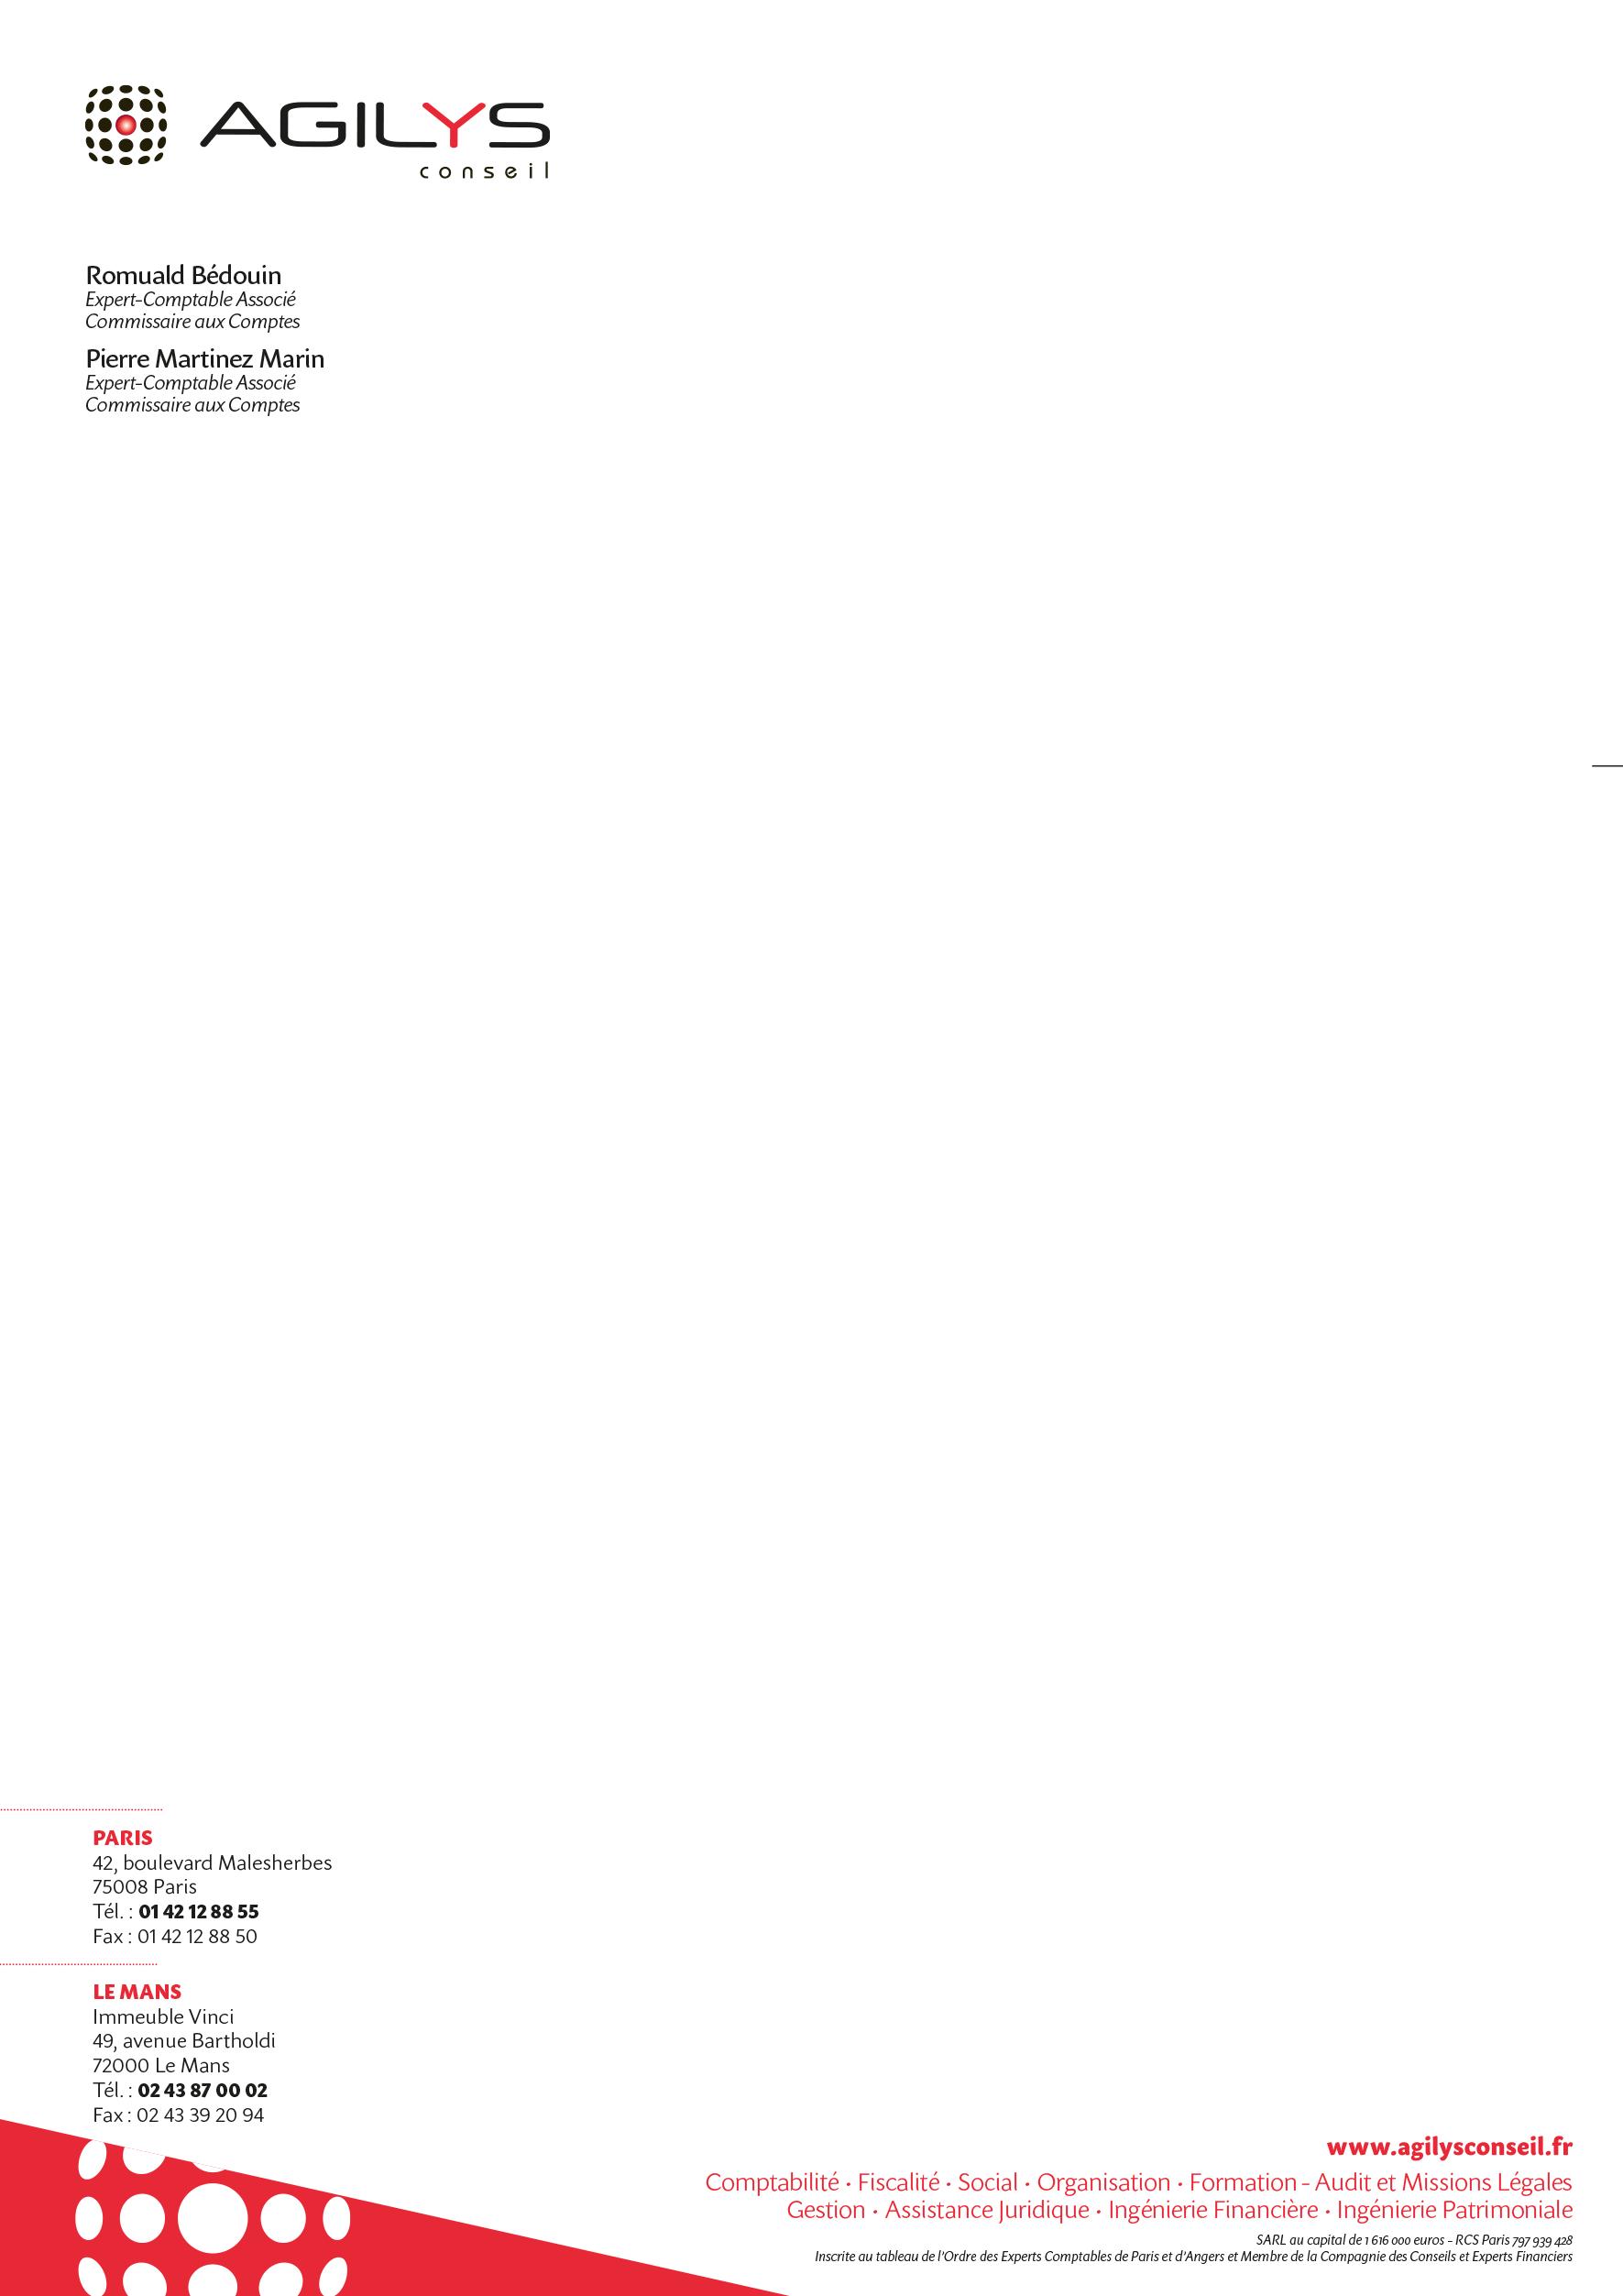 1312-20-AGILYS-CONSEIL-TDL.png